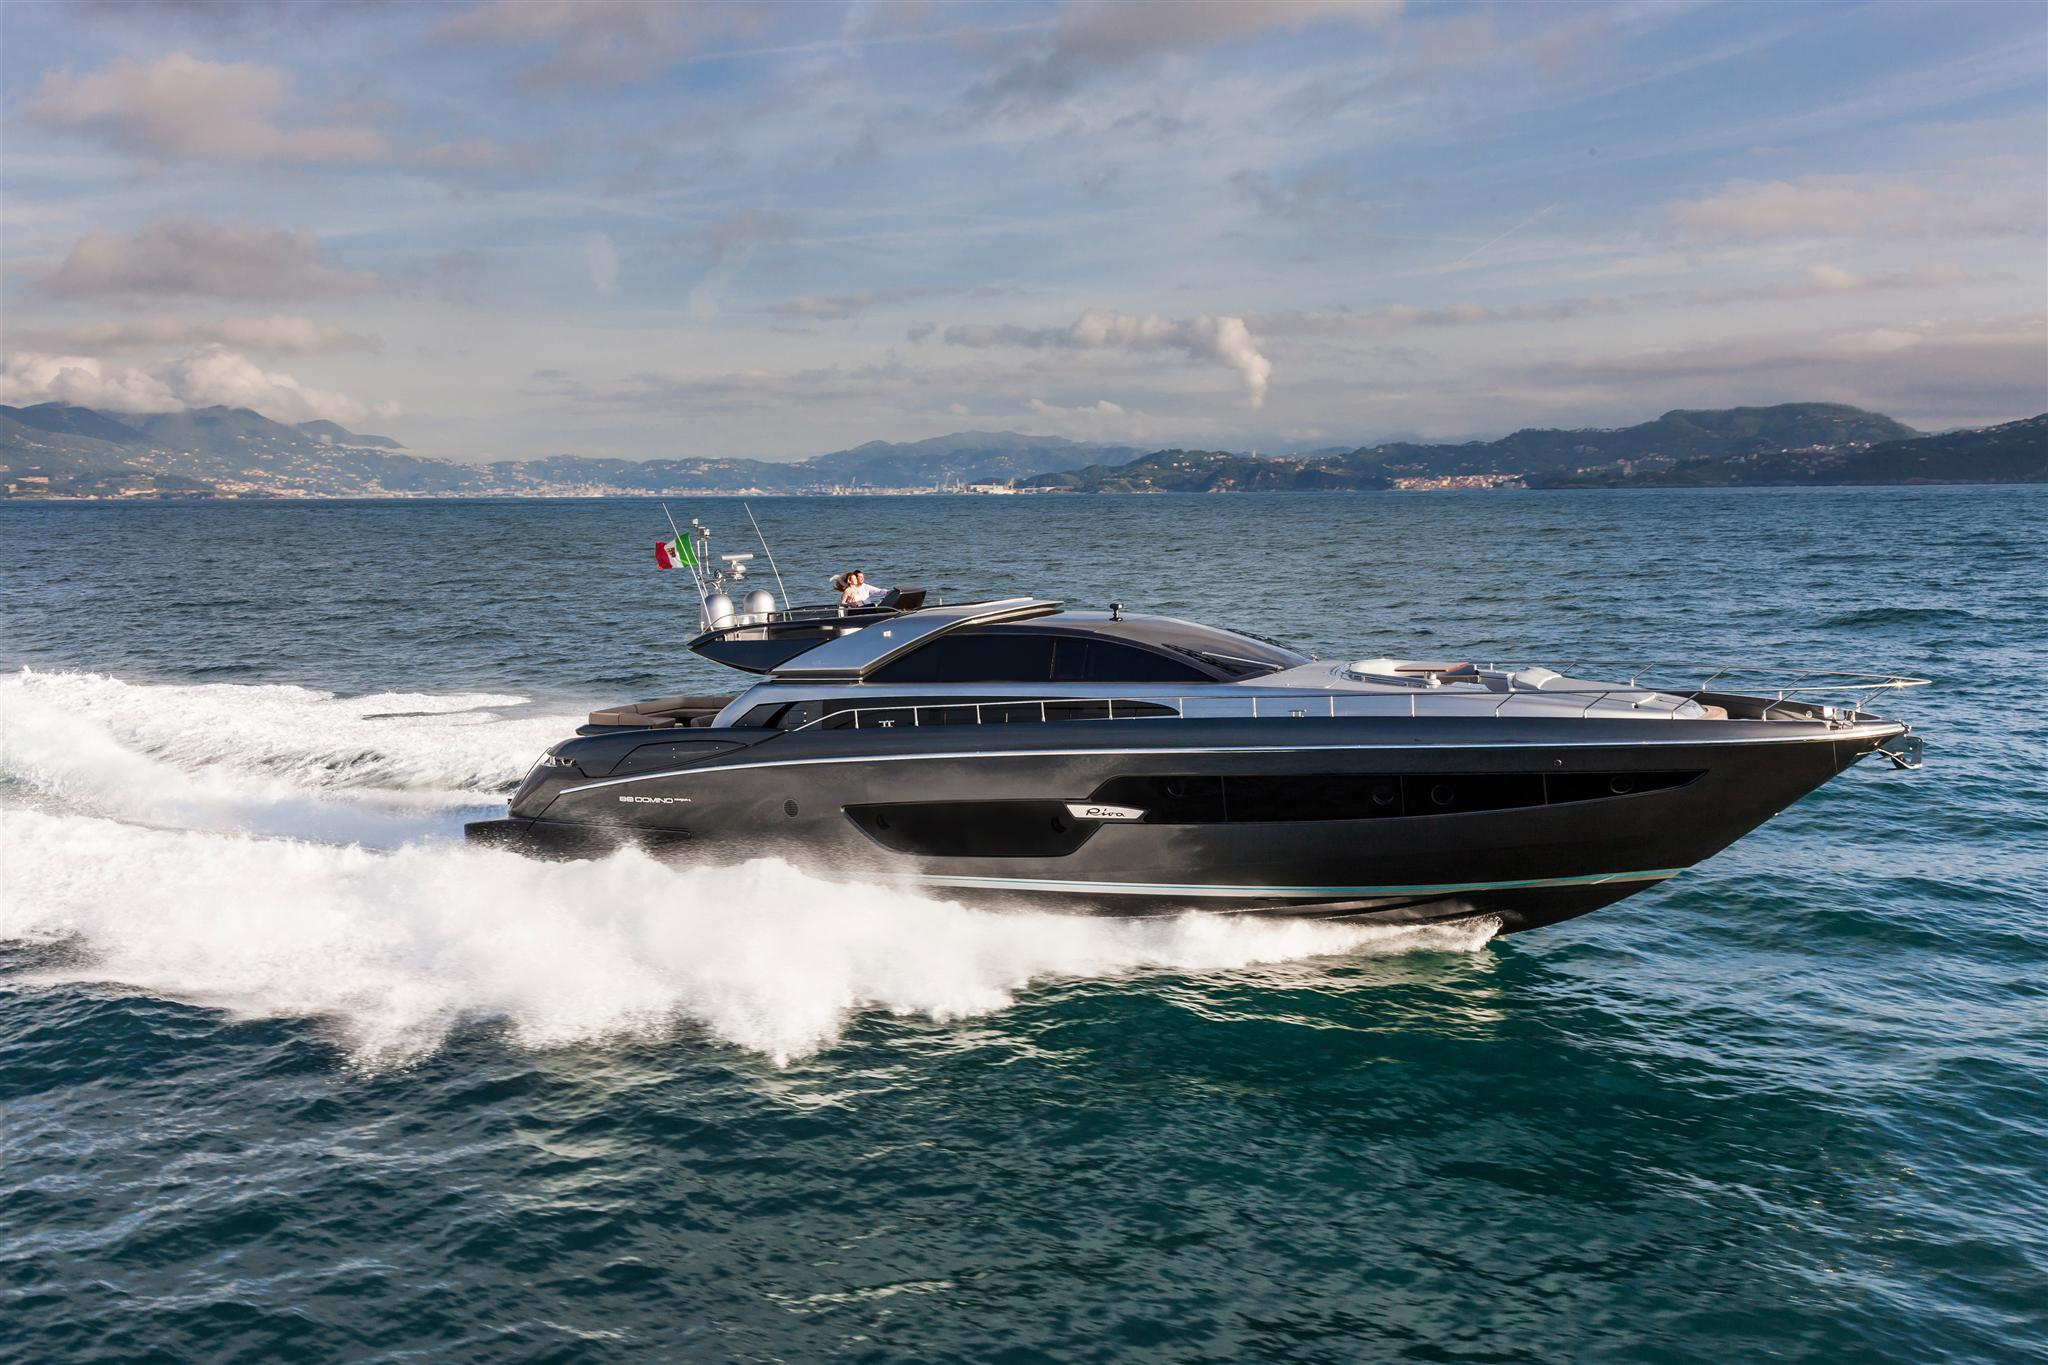 Used 2015 Tahoe >> nouveau RIVA 88 DOMINO SUPER - Ita Yachts Canada - Ita Yachts Canada